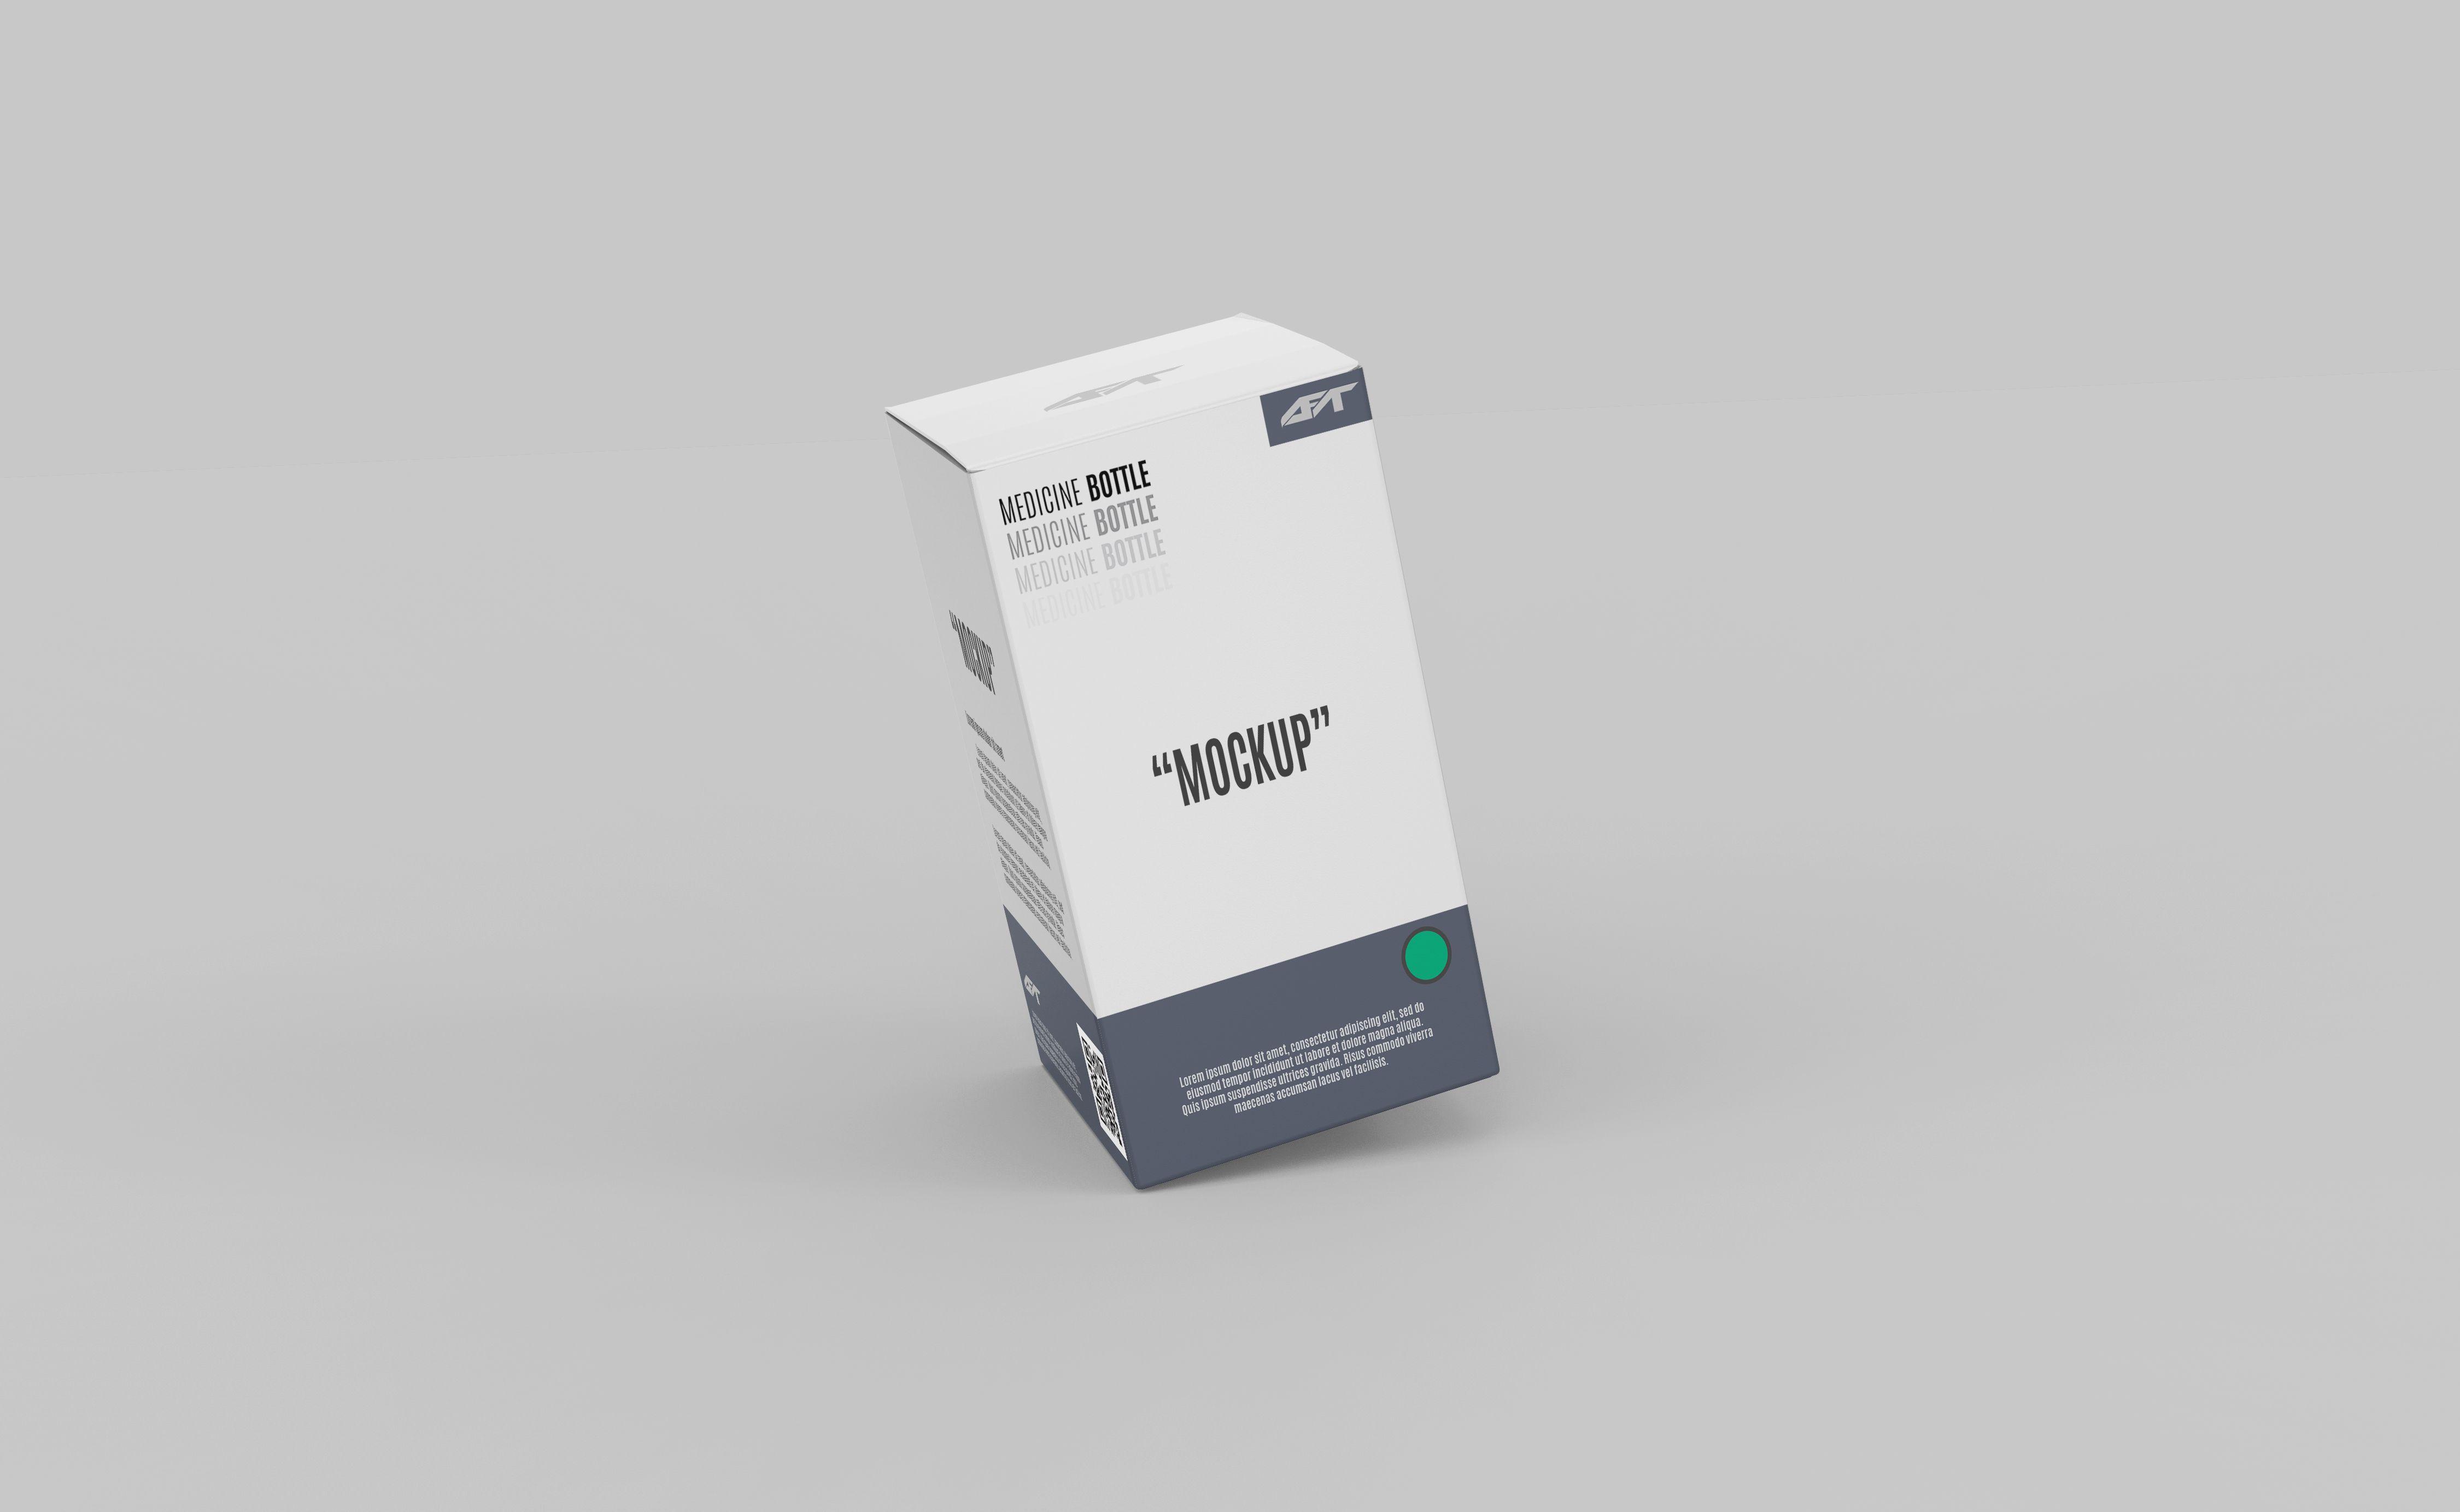 Download Box Packaging Mockup Box Packaging Packaging Mockup Packaging